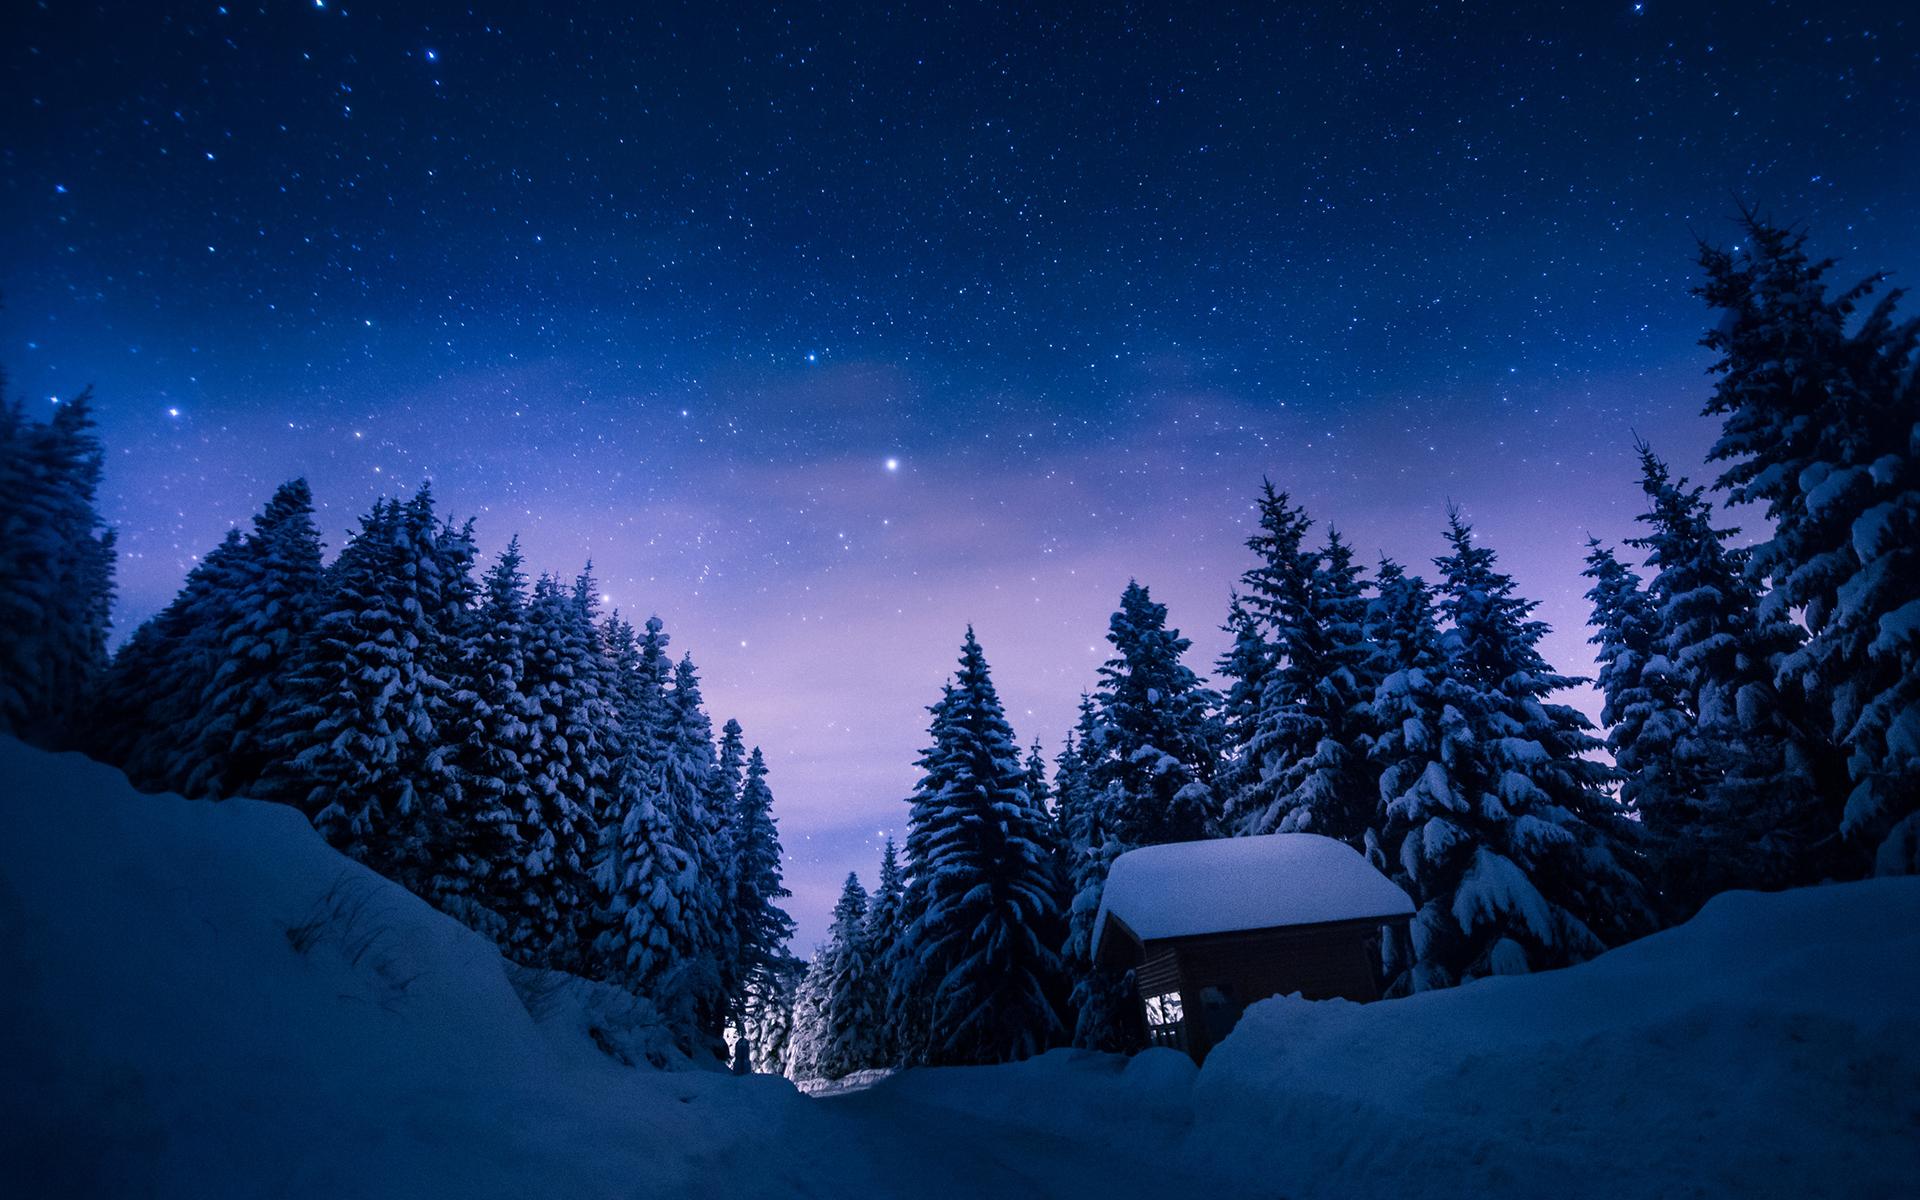 Snow night wallpaper hd